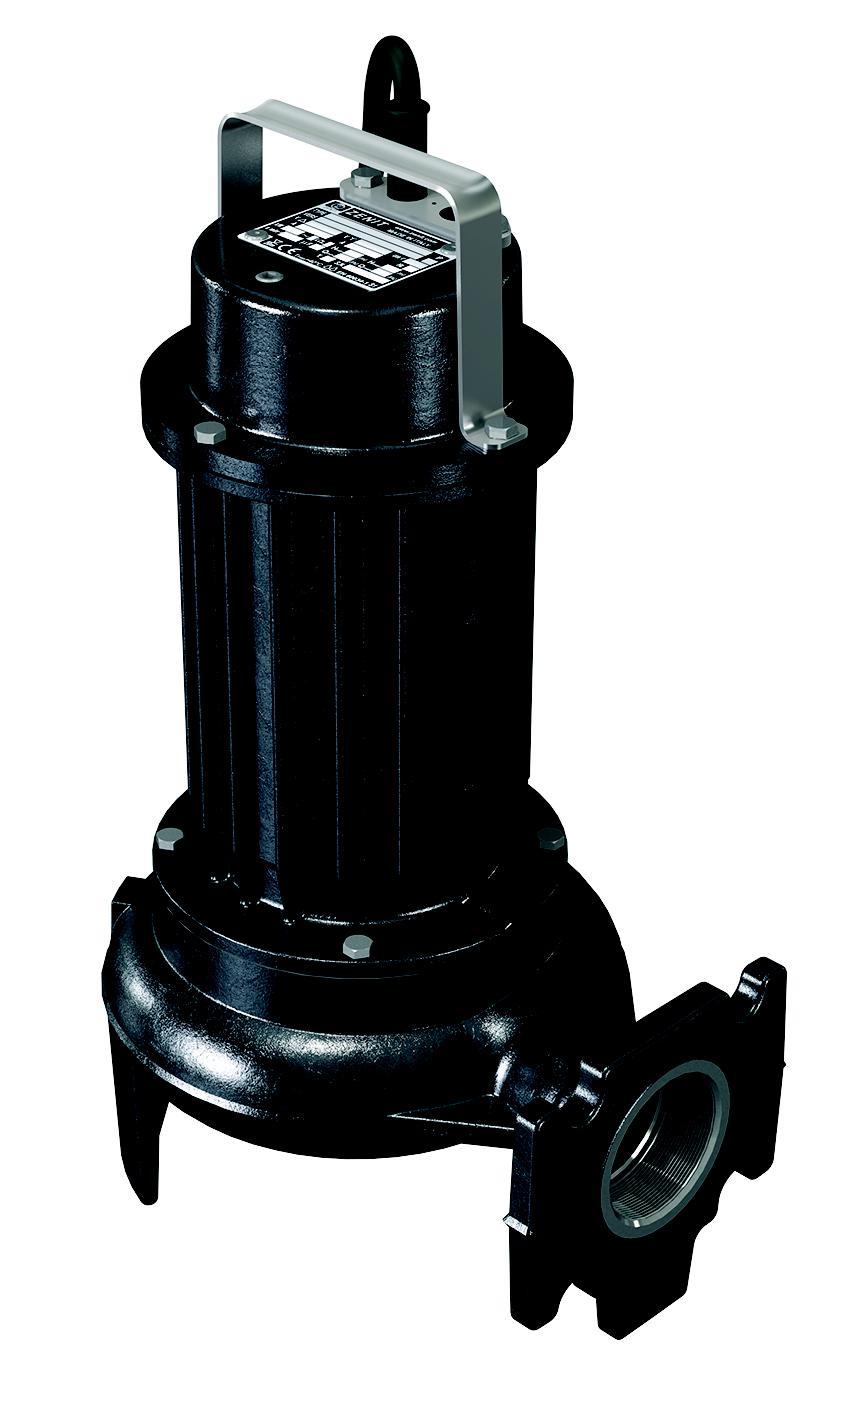 Насос Zenit Dgo 200/2/g50v b0cm5 nc q tcsgt e-sical 05 sicher b2 kursbuch